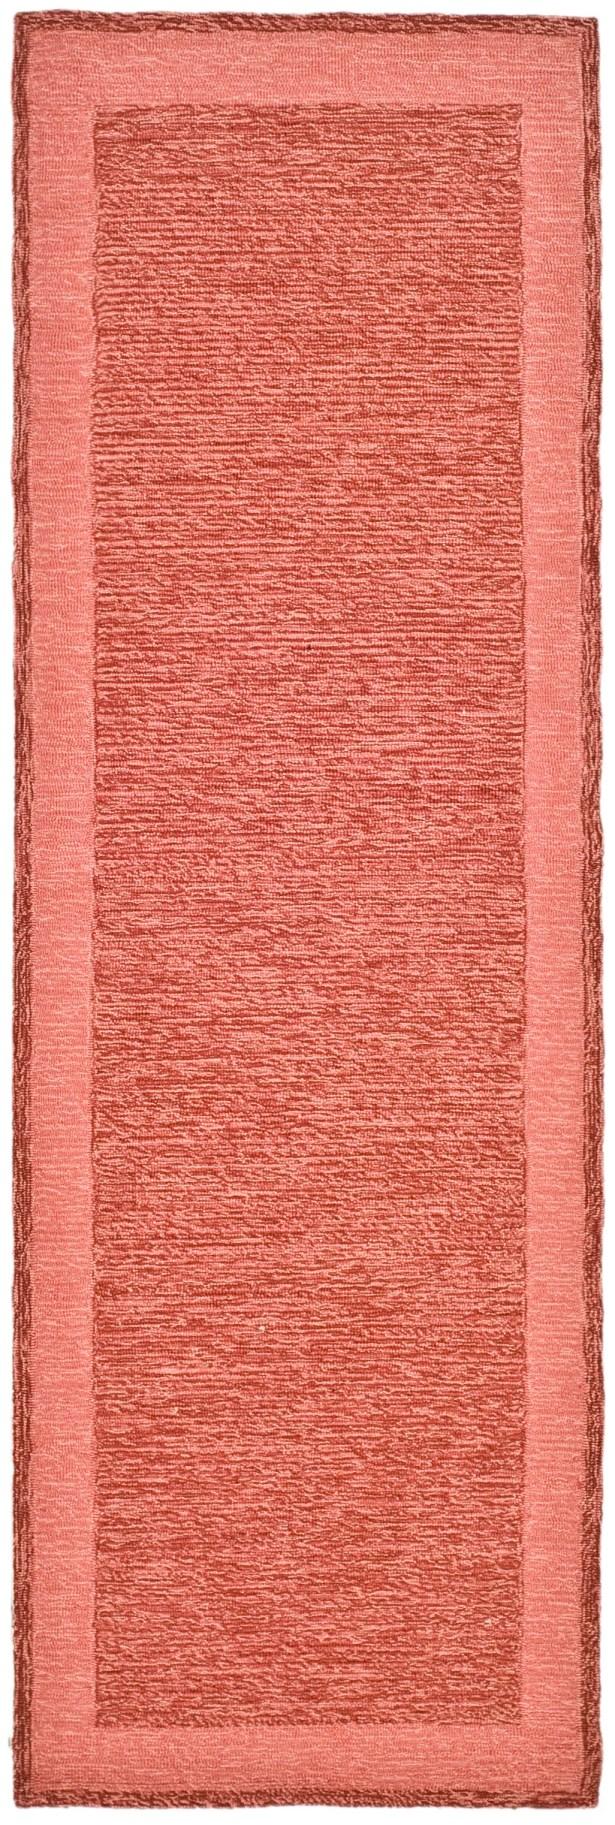 DuraRug Red Area Rug Rug Size: Runner 2'6